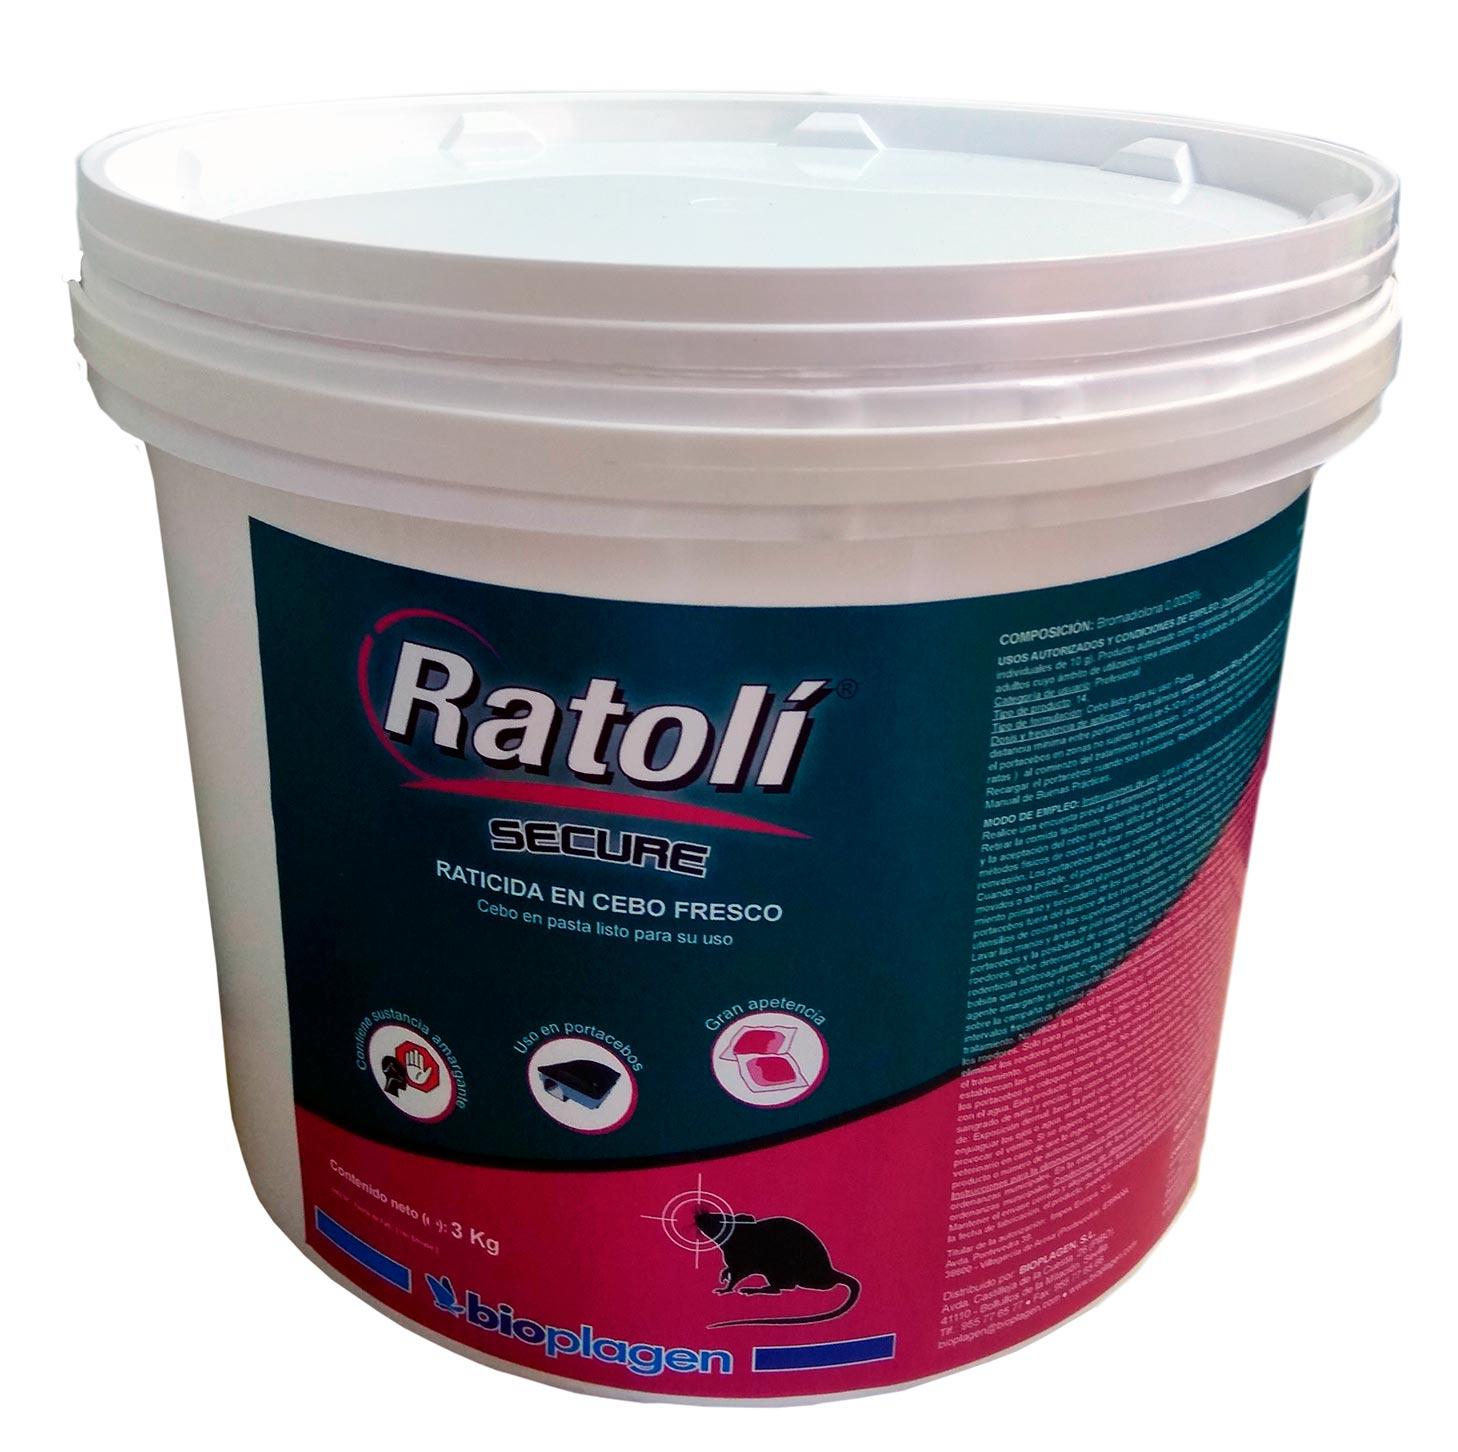 RATOLI SECURE CEBO FRESCO 10 KG  (RD)